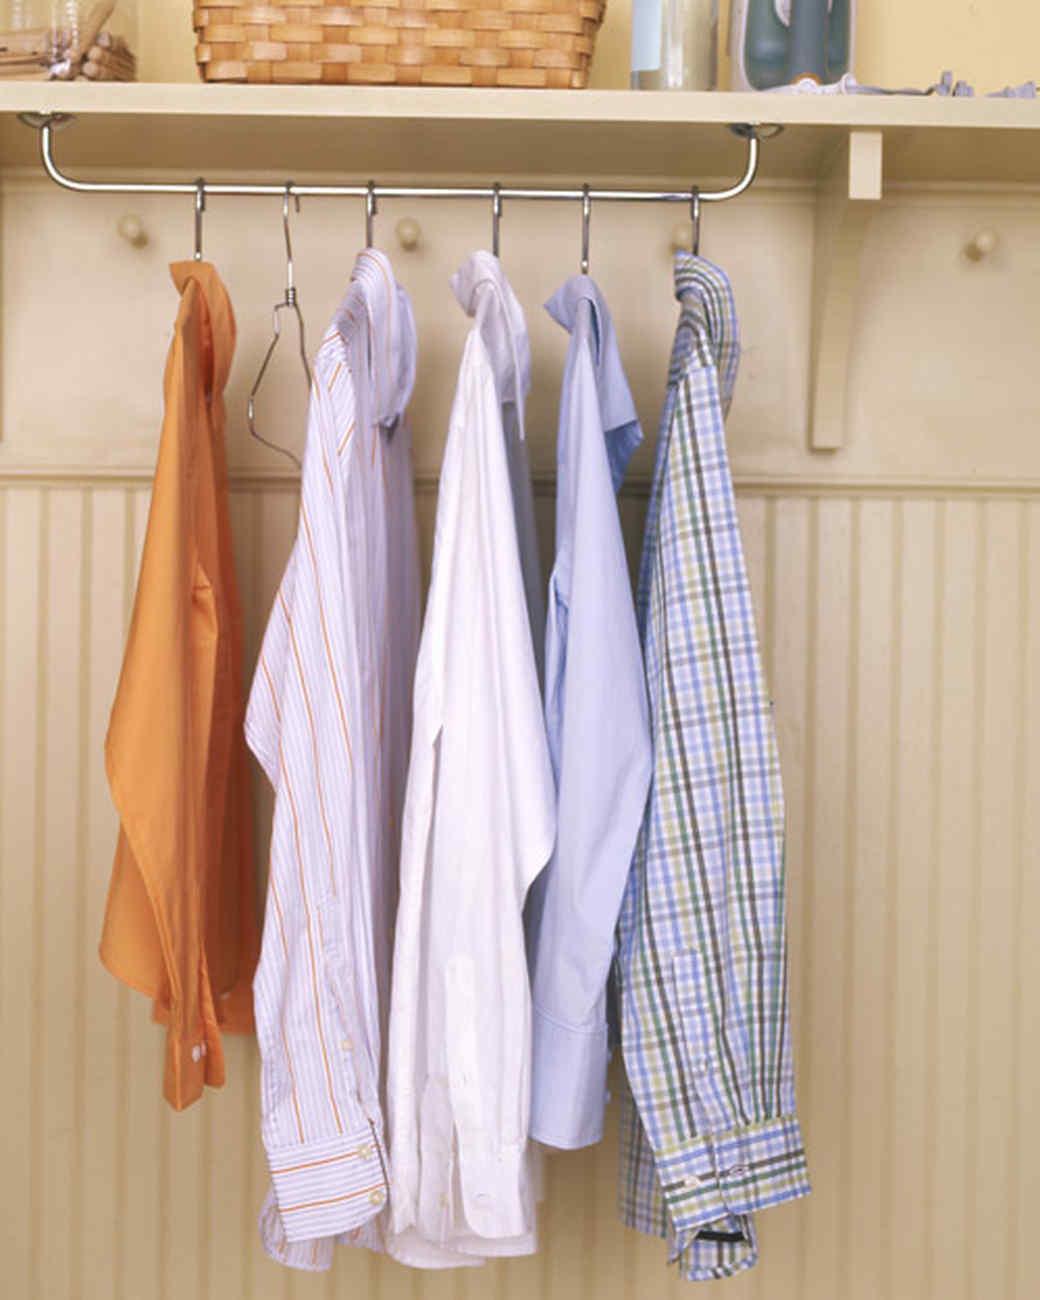 la101208_0605_drying1.jpg